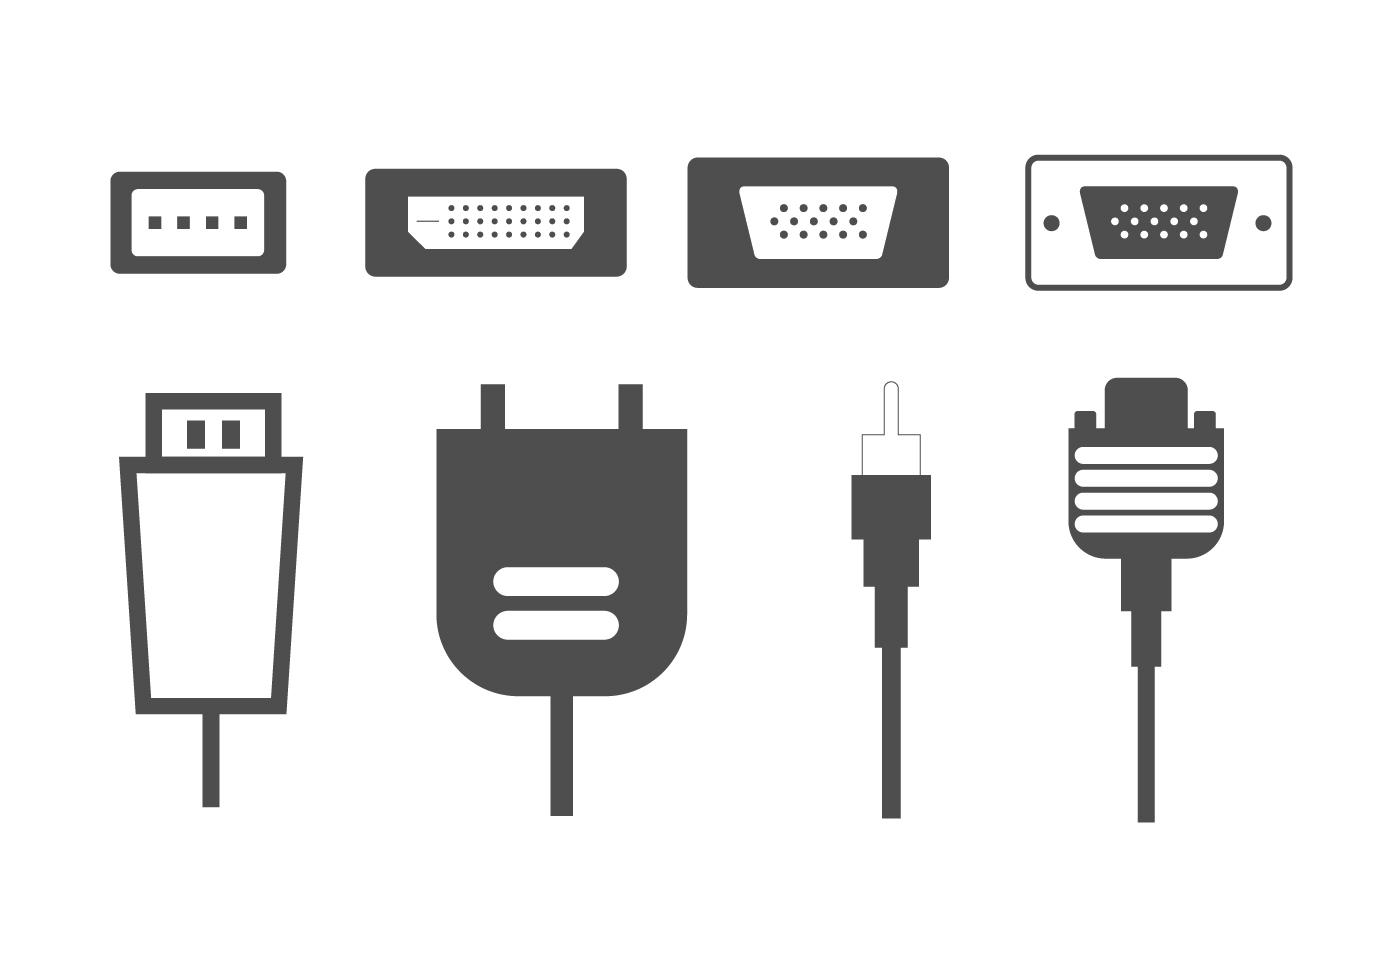 hdmi cable connectors